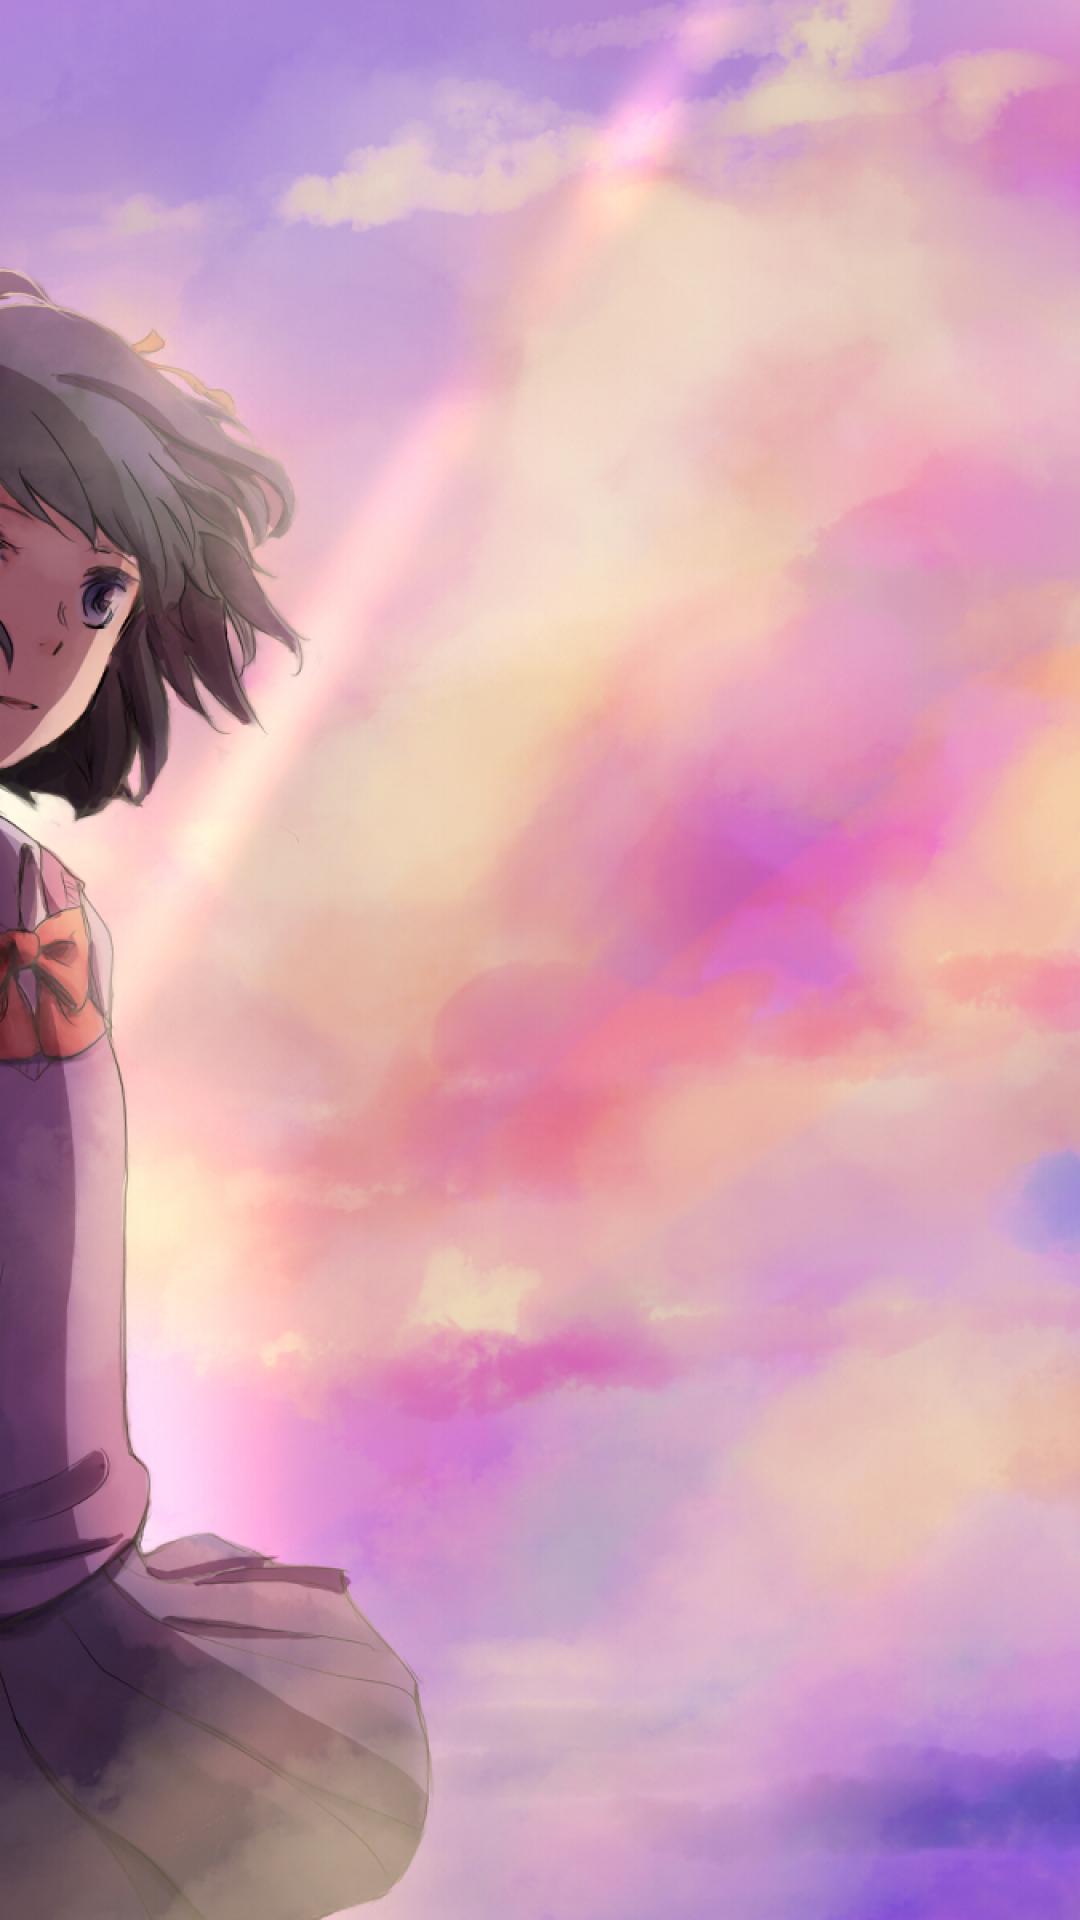 Kimi No Na Wa, Mitsuha Miyamizu, Taki Tachibana, Clouds, - Mitsuha Your Name Wallpaper Iphone - HD Wallpaper